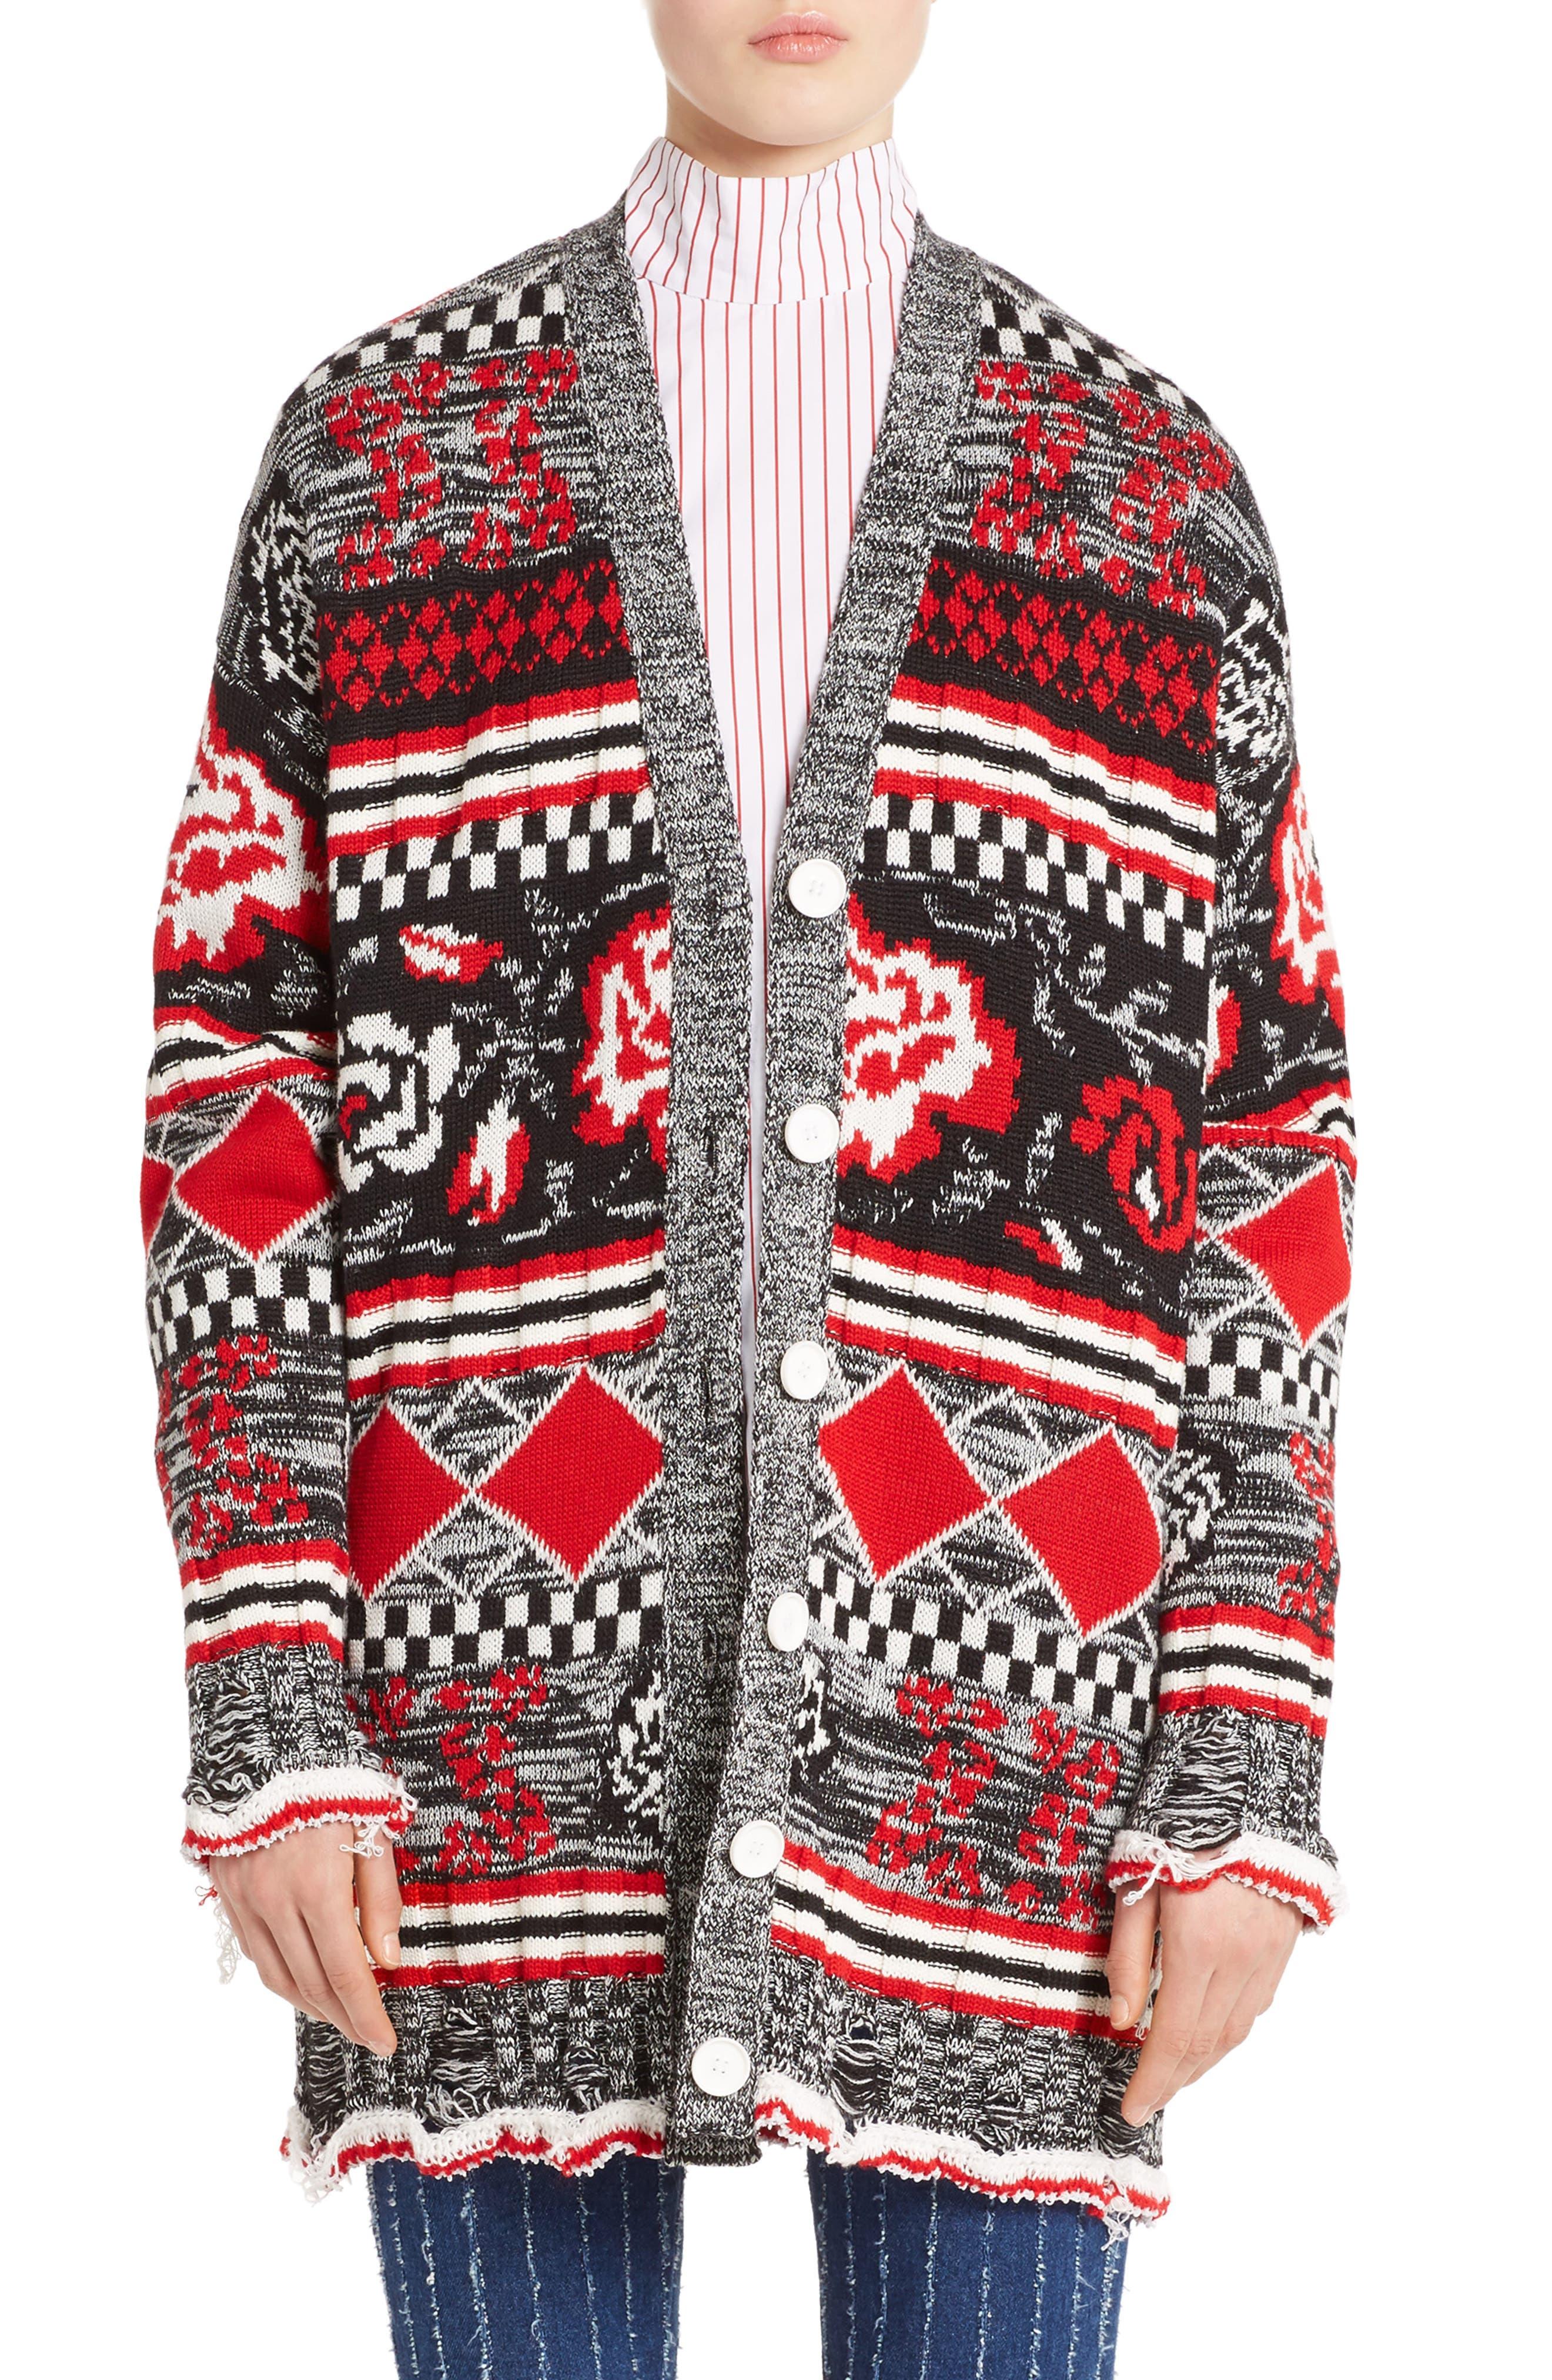 Rose Jacquard Wool Blend Cardigan,                             Main thumbnail 1, color,                             Black/ Red/ White